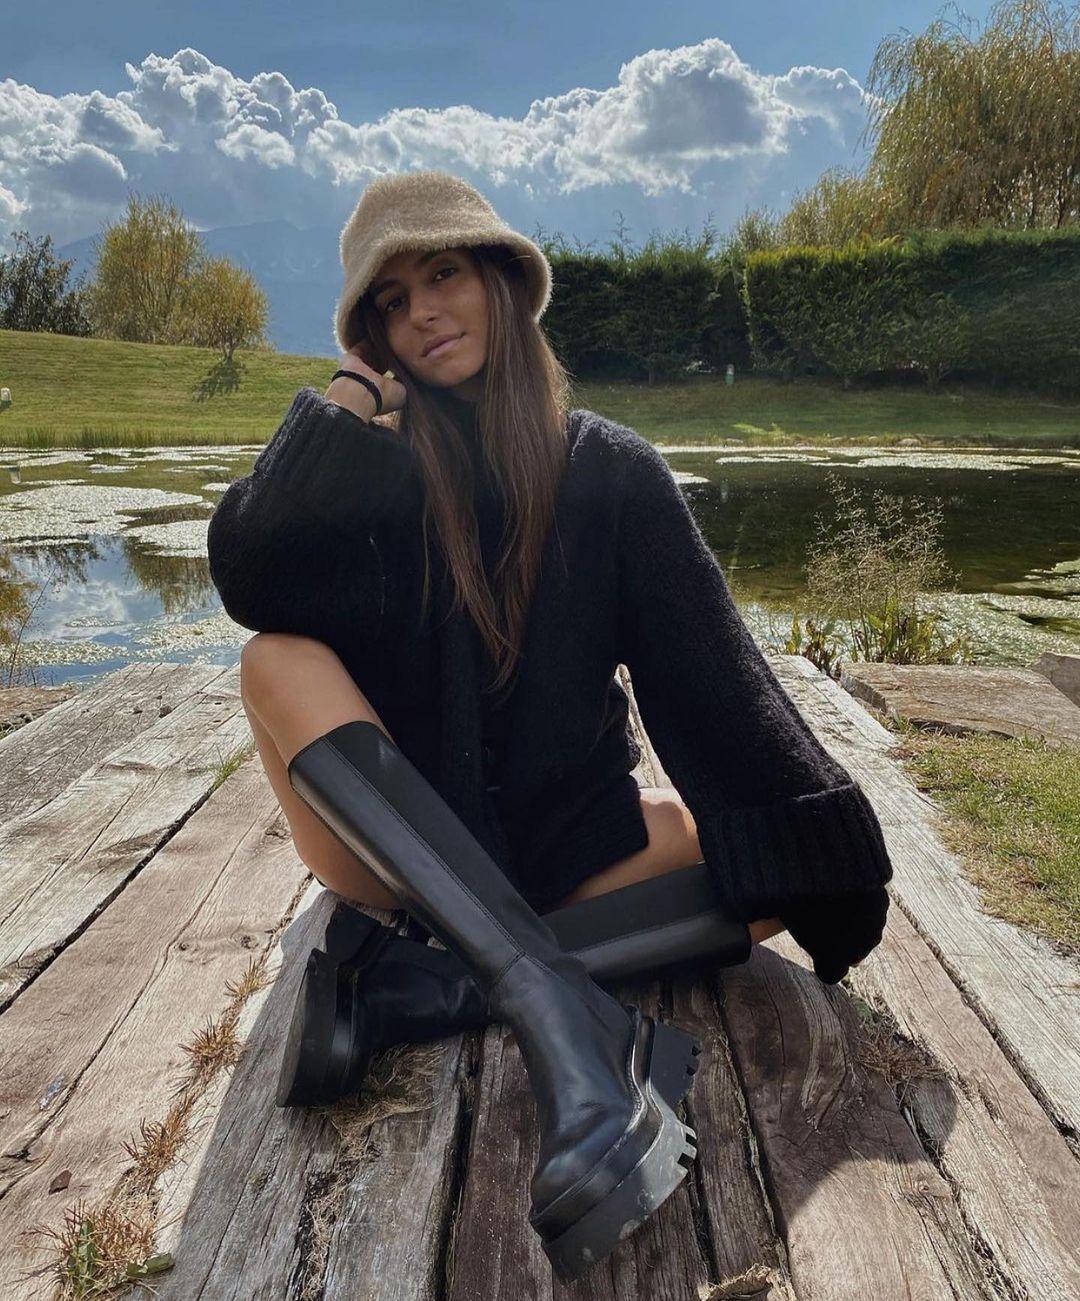 leather flat boots with track soles de Zara sur zaraaddiction